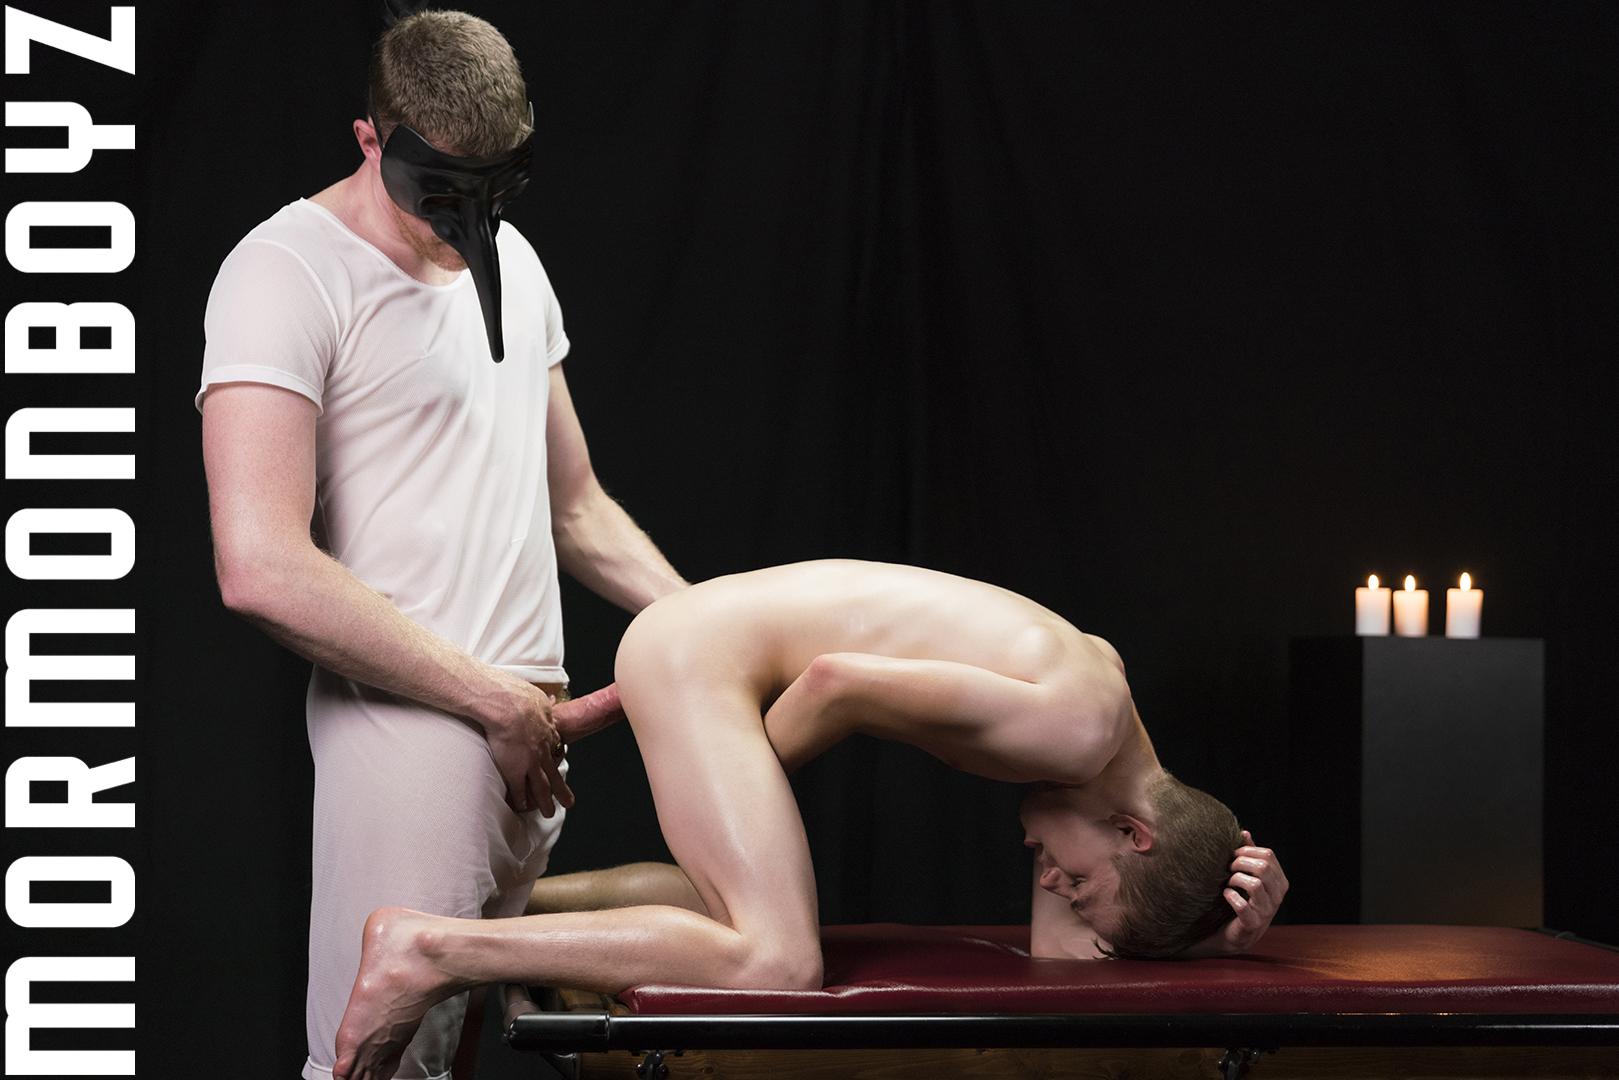 170820_mbz_07-mormonboyz-gay-daddy-son-sex_pic20